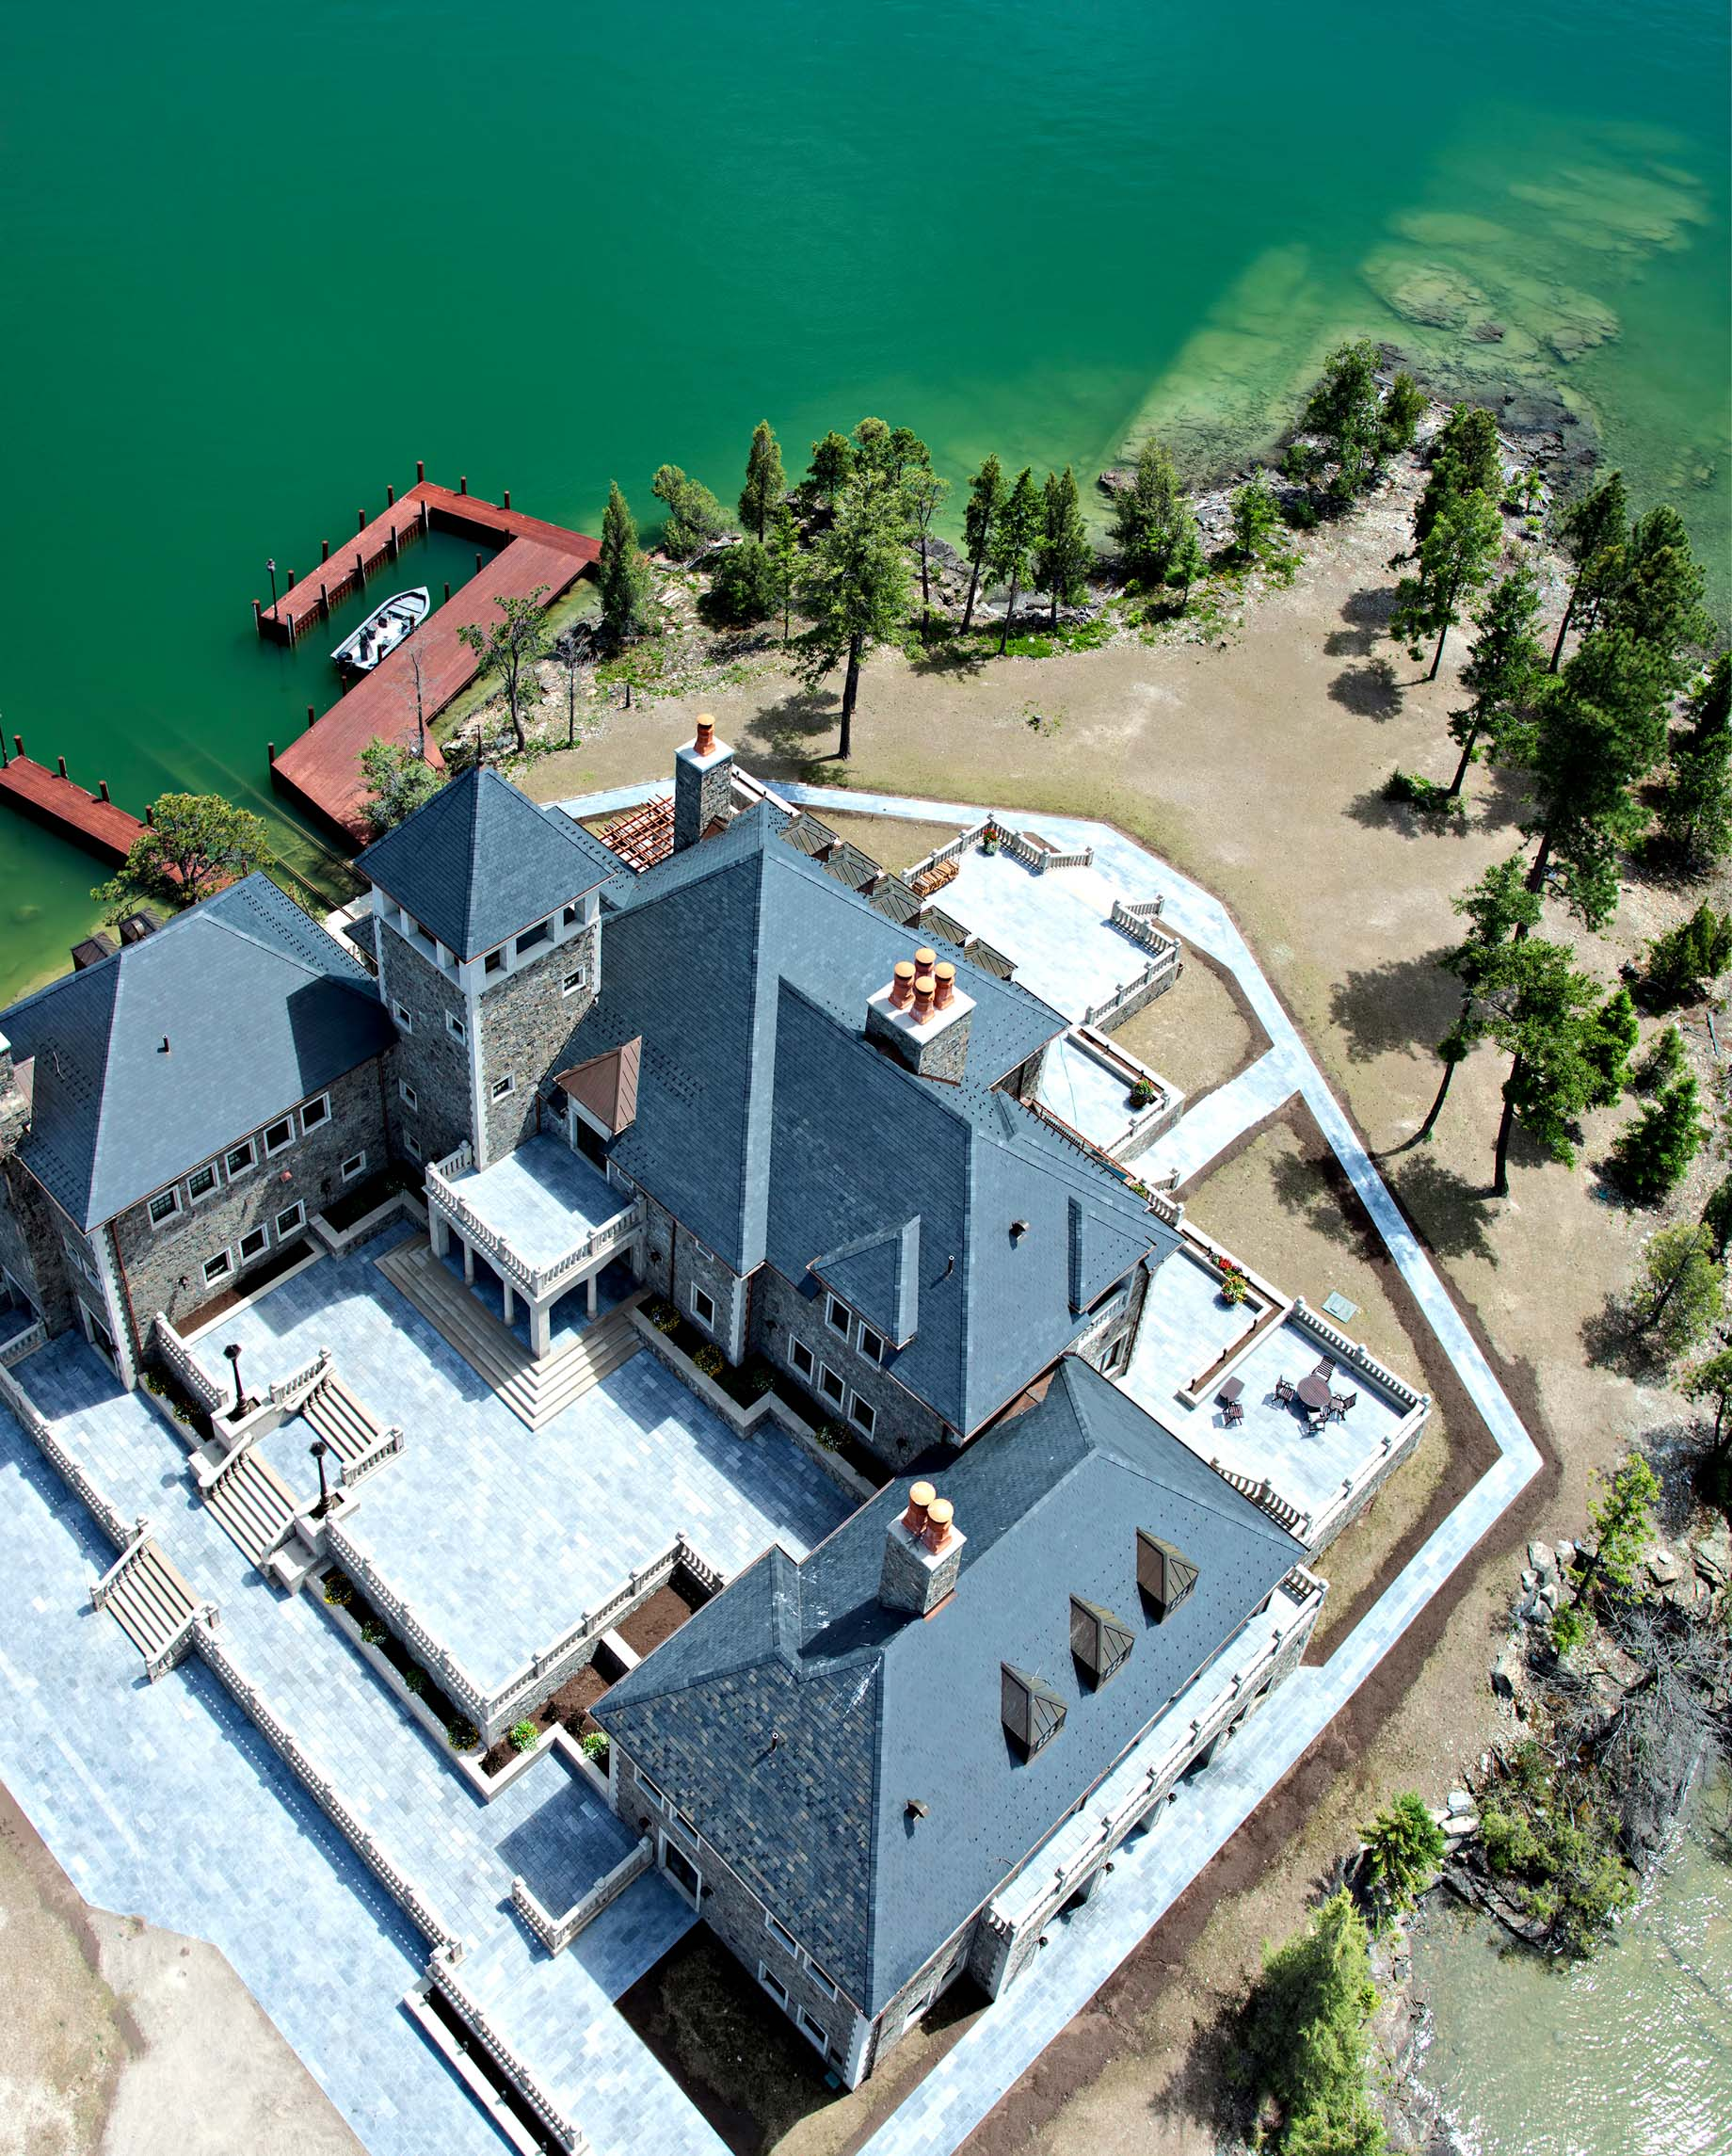 Shelter Island Private Estate - Flathead Lake, Rollins, MT, USA